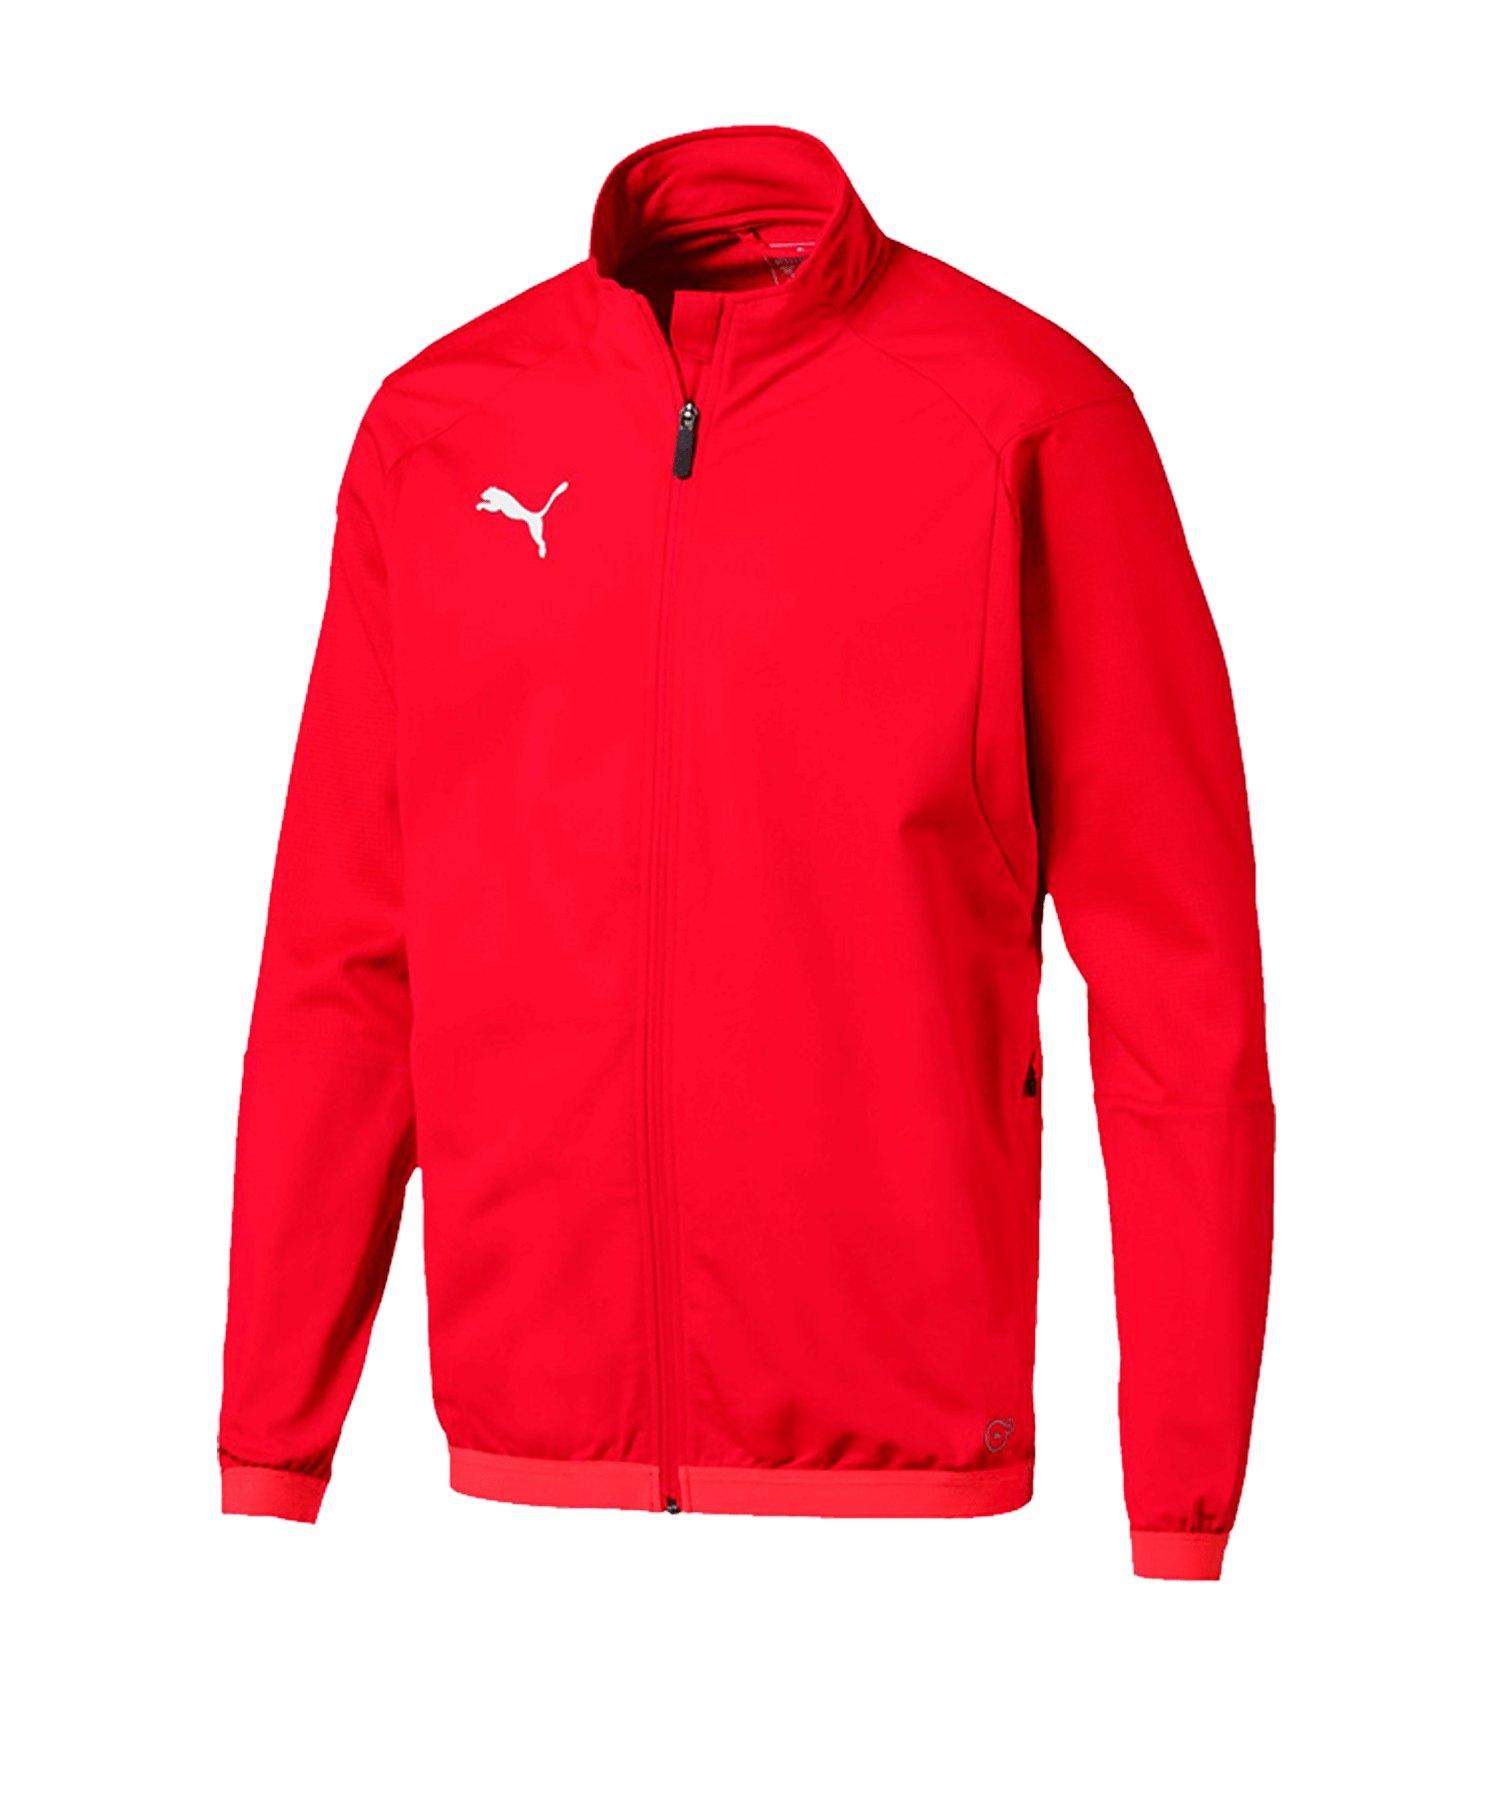 PUMA LIGA Training Jacket Trainingsjacke Rot F01 - rot